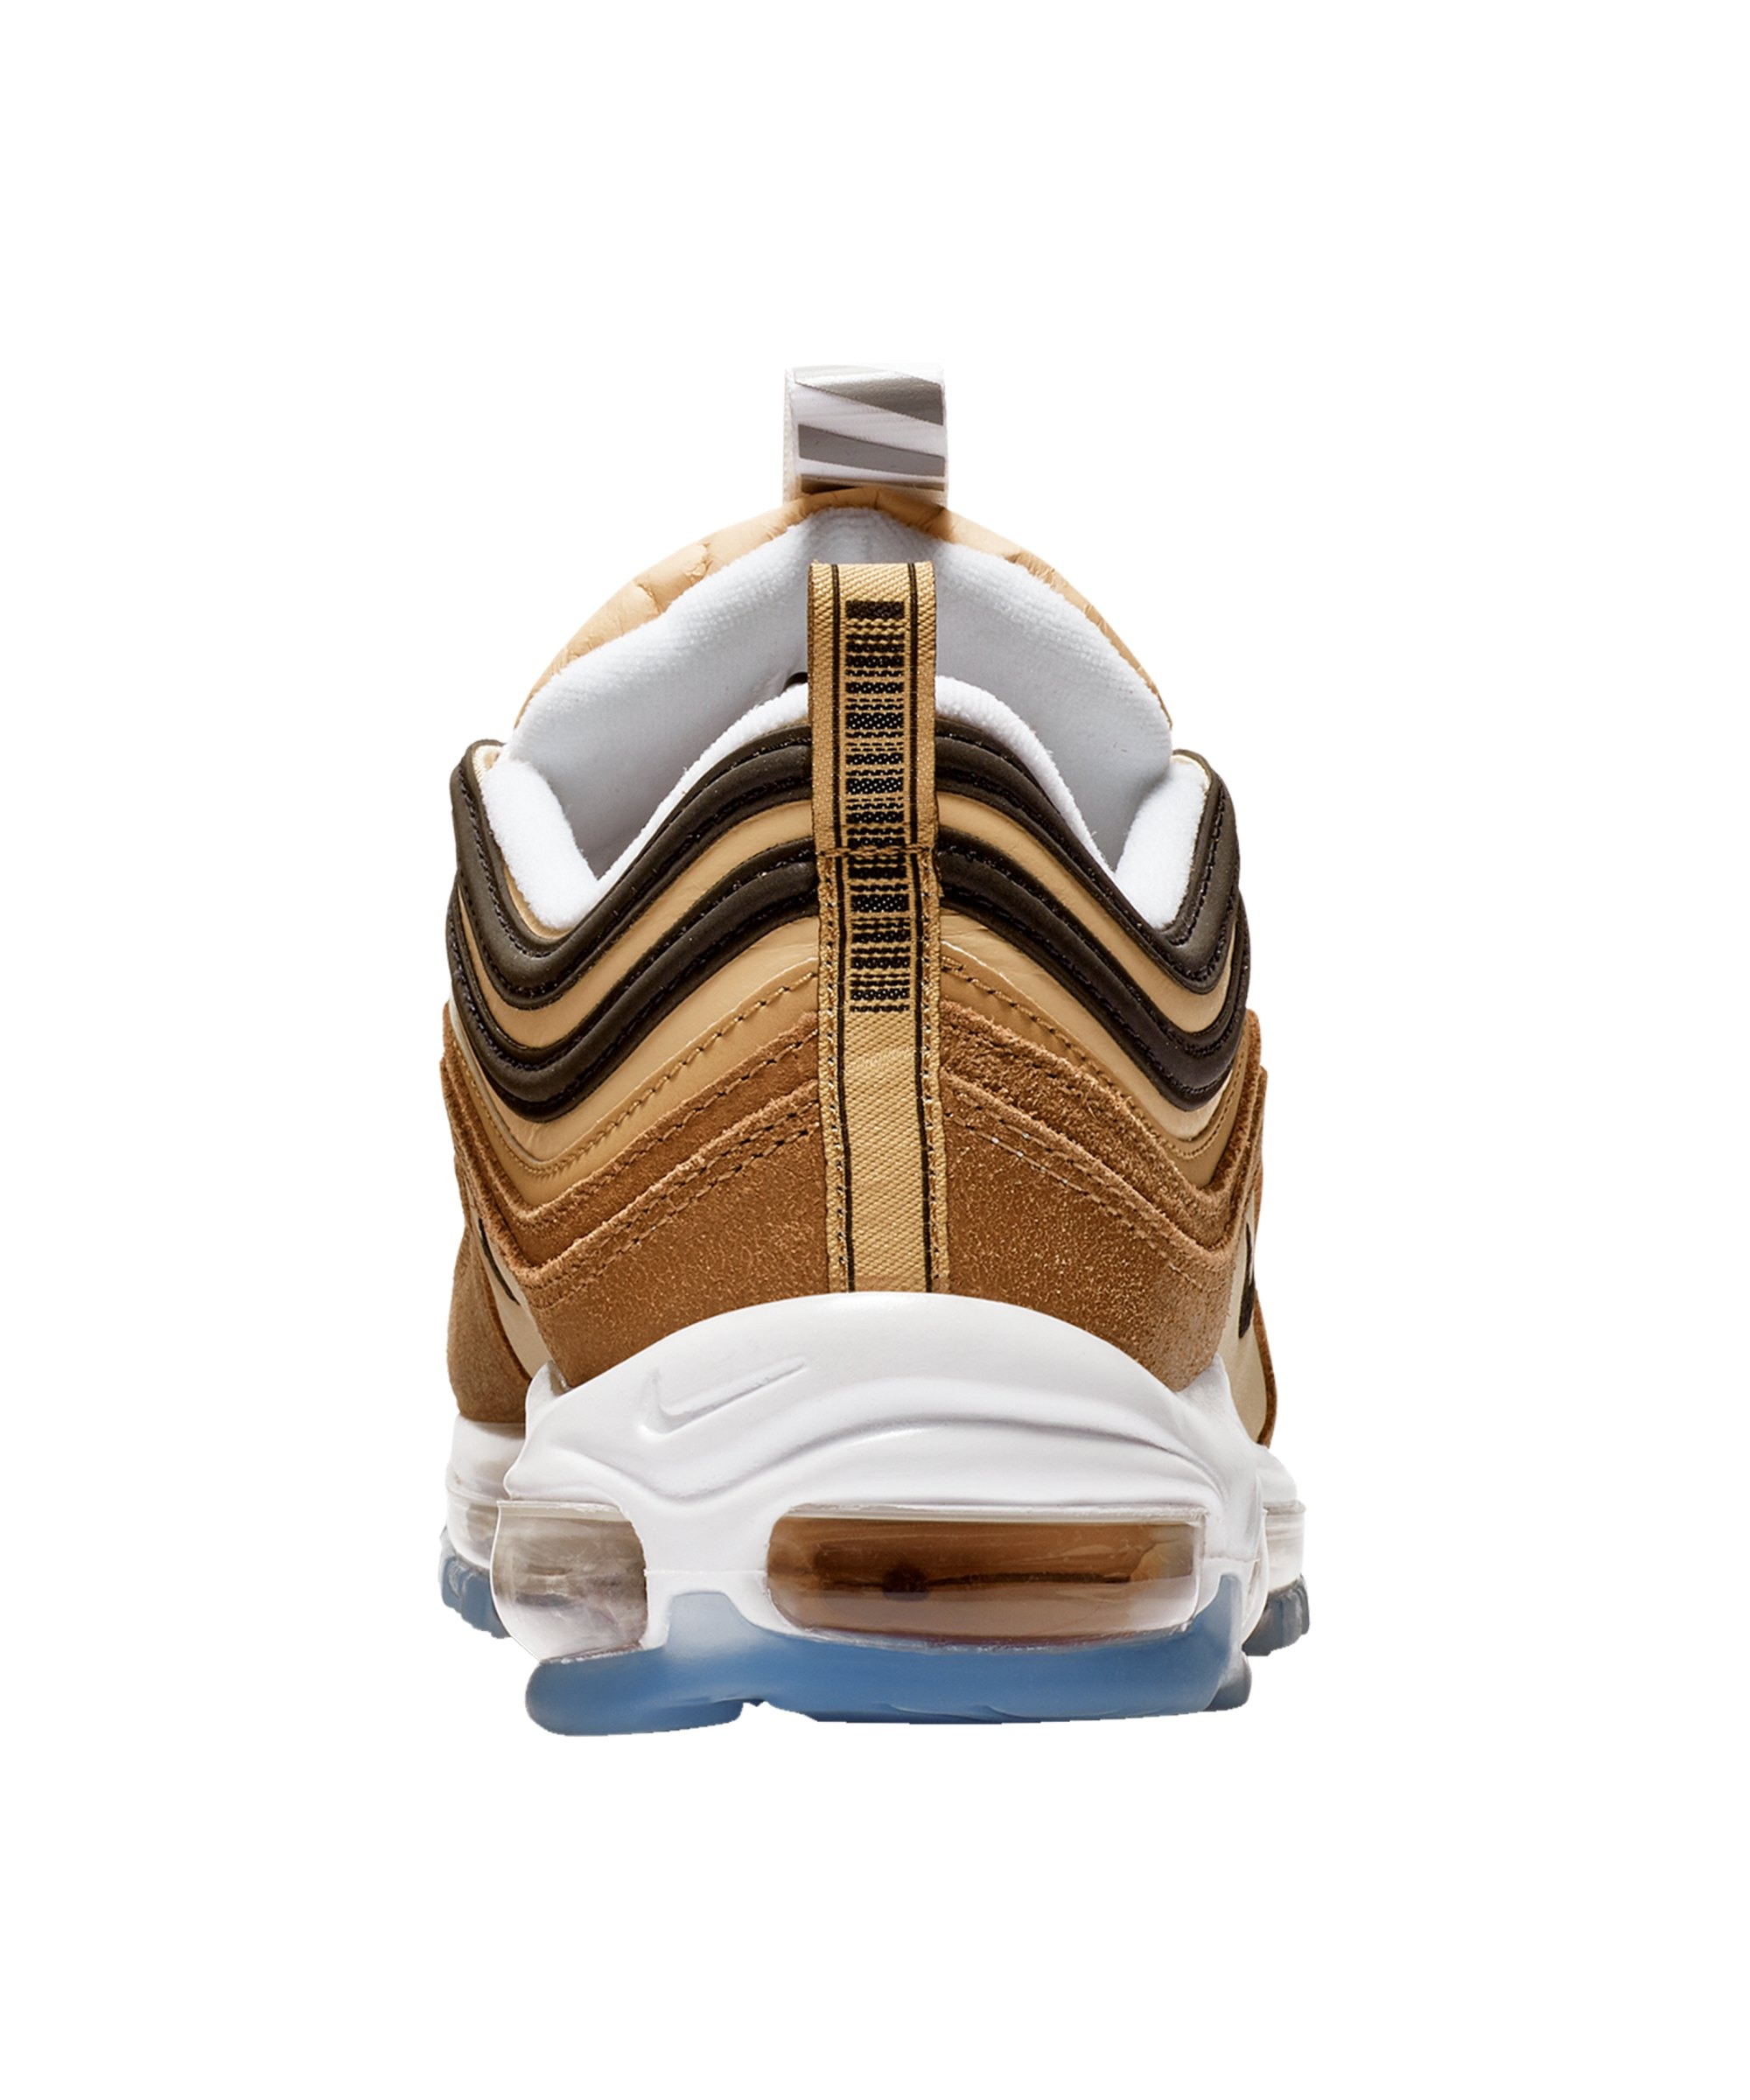 info for 936cb ebd2e ... Nike Air Max 97 Sneaker Braun Beige Schwarz F201 - braun ...